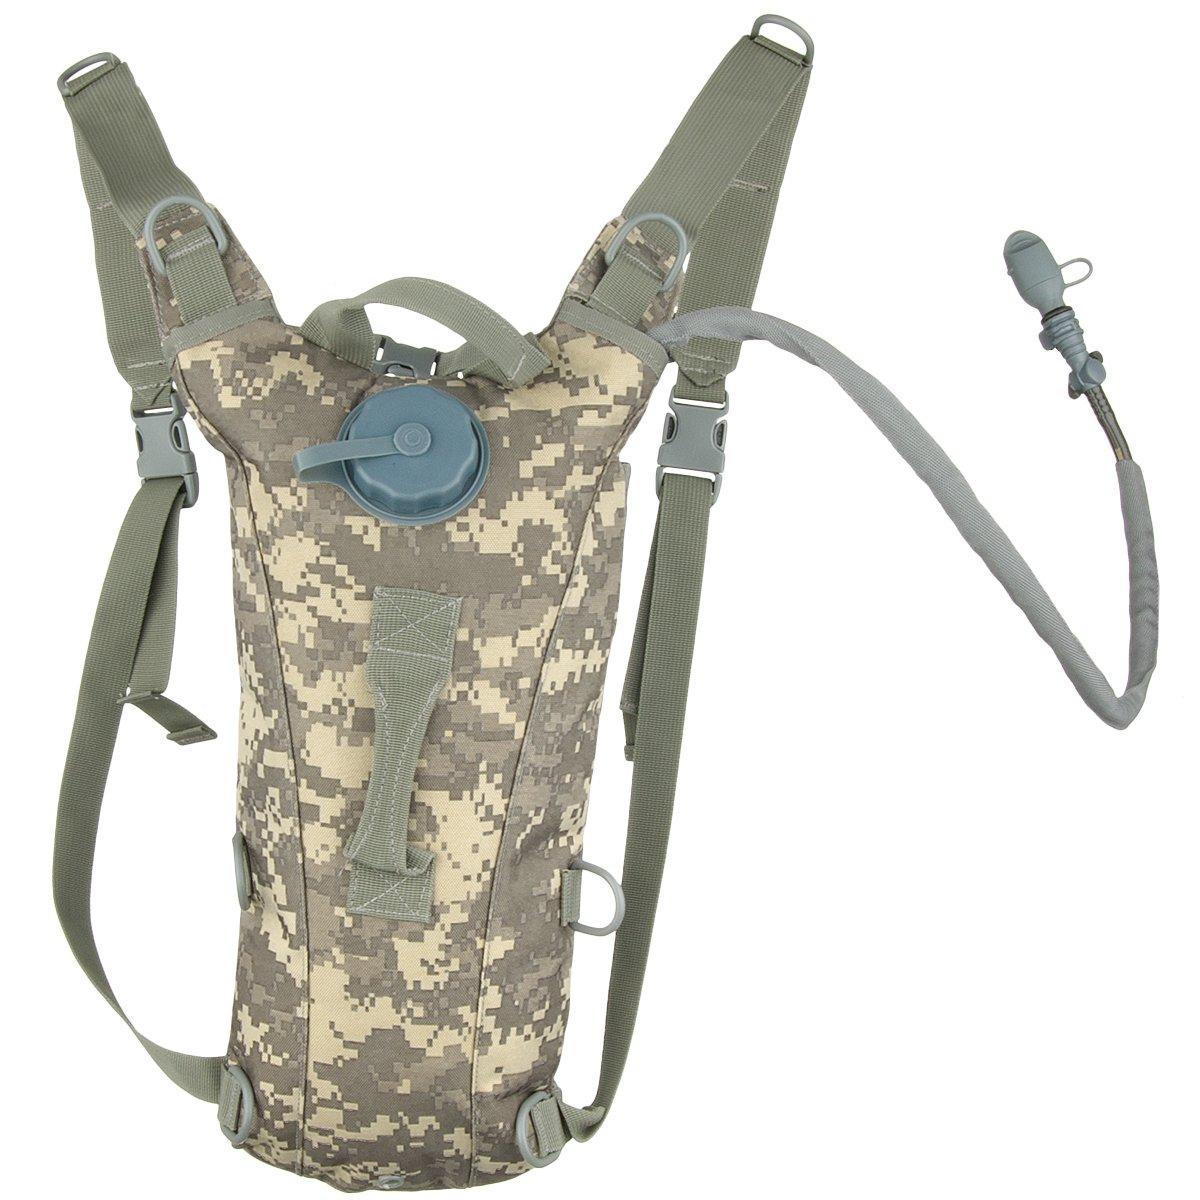 MFH Hydration Backpack TPU Extreme ACU Digital by MFH Max Fuchs